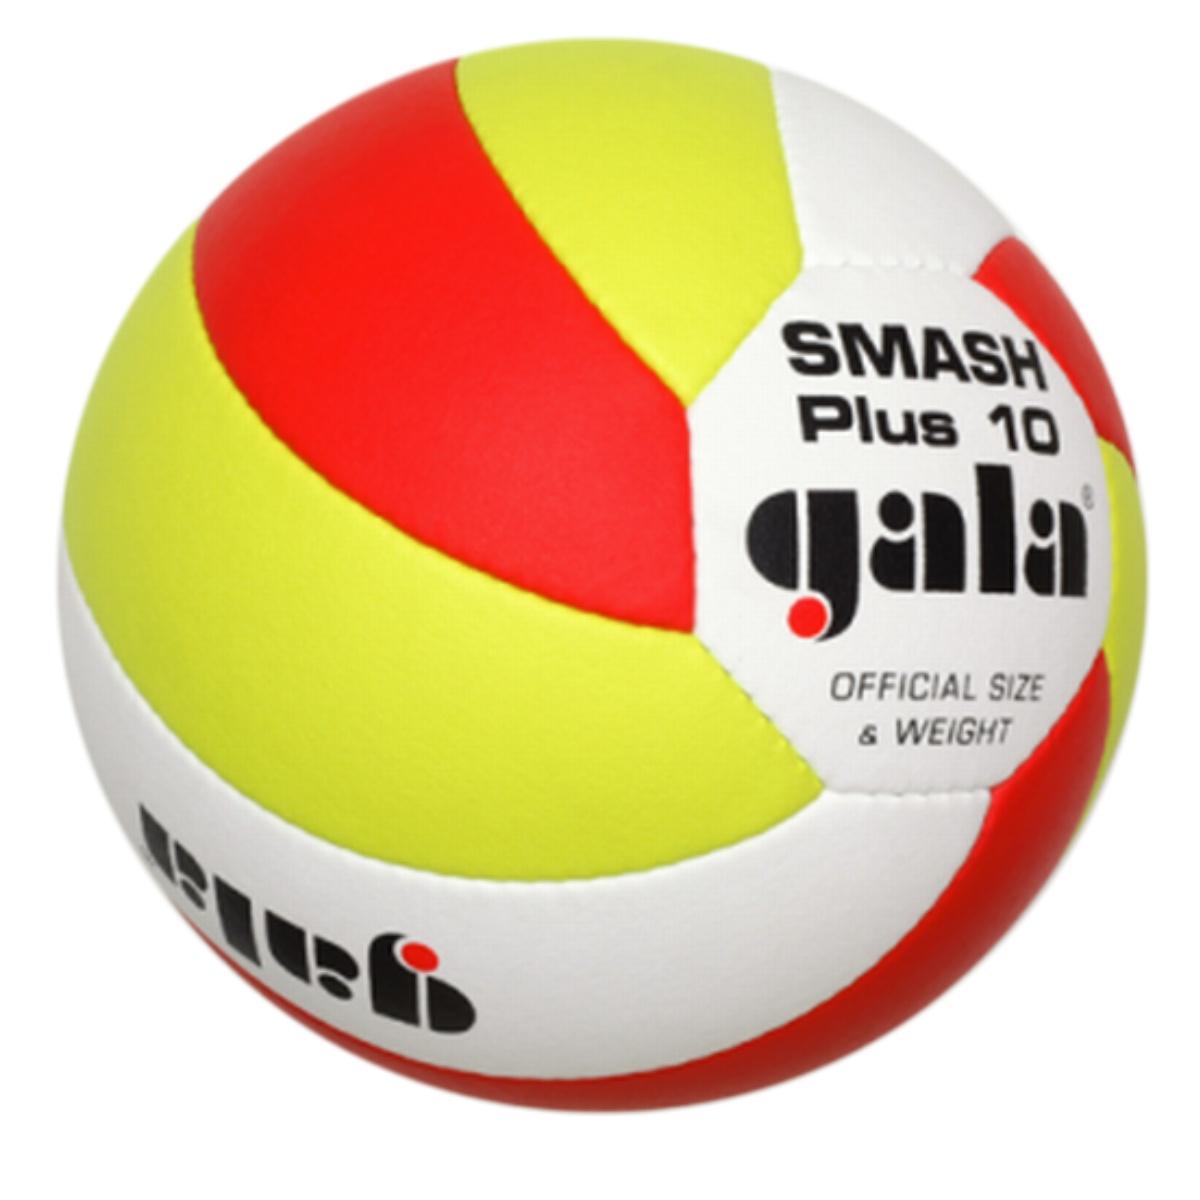 Volejbalový míč GALA Smash Plus 10 5163S